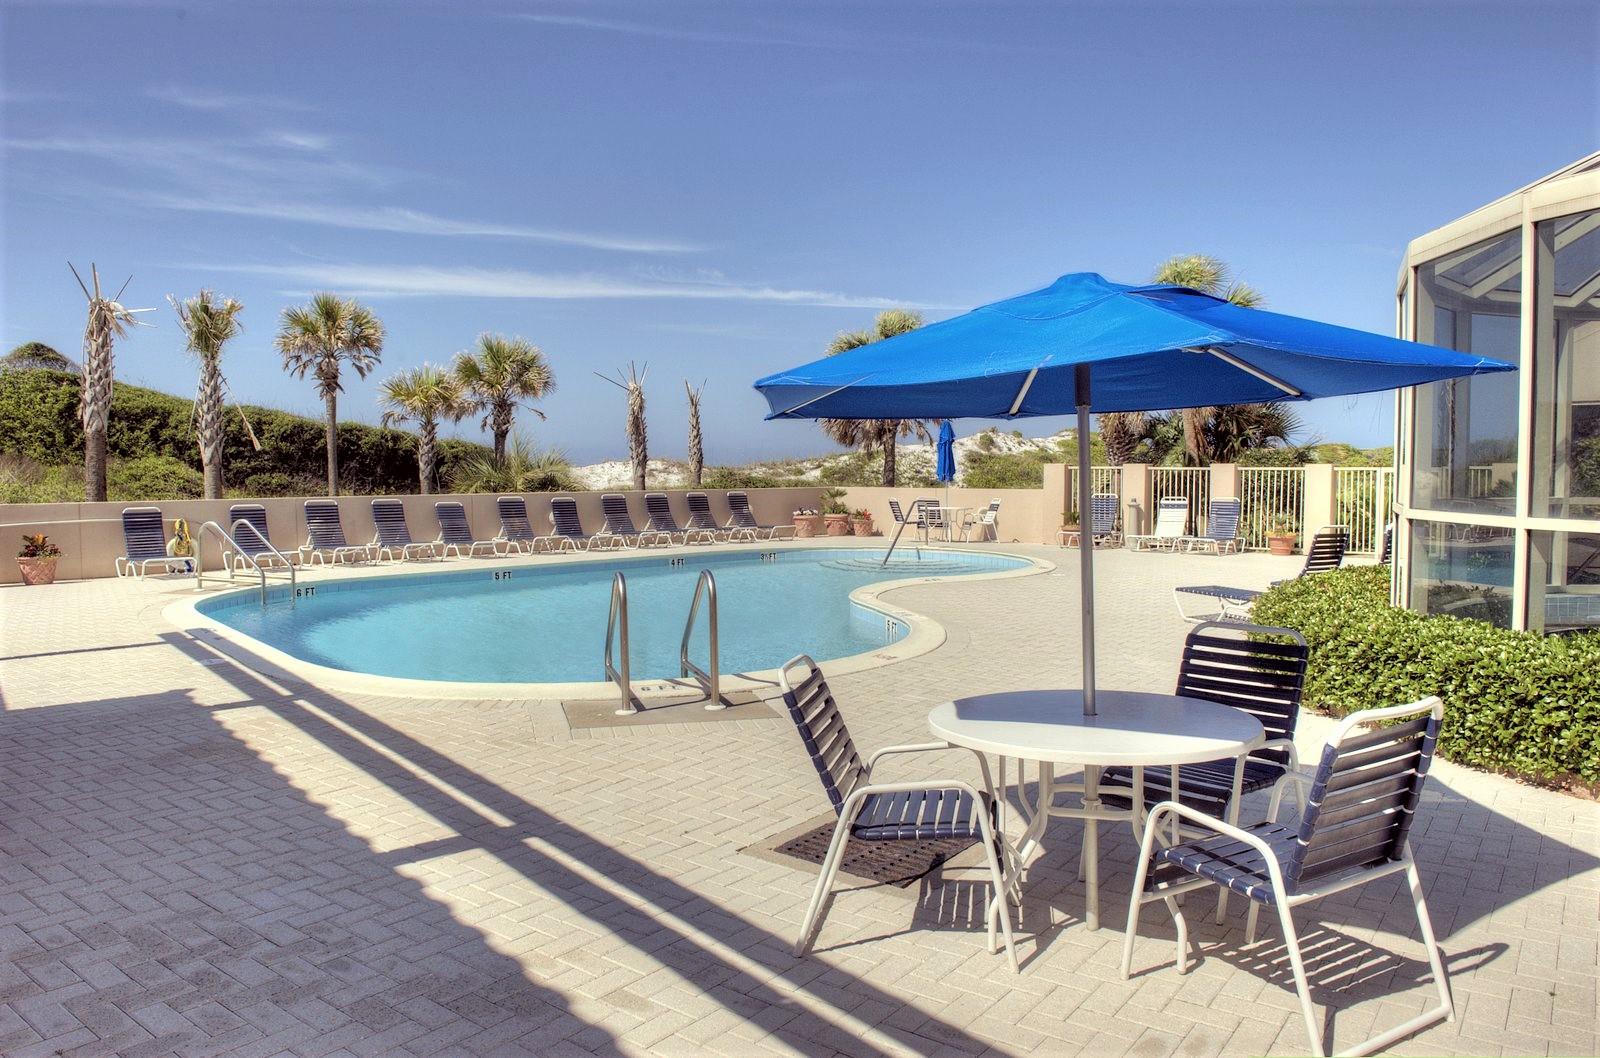 905 Tops'l Beach Manor Condo rental in TOPS'L Beach Manor  in Destin Florida - #21